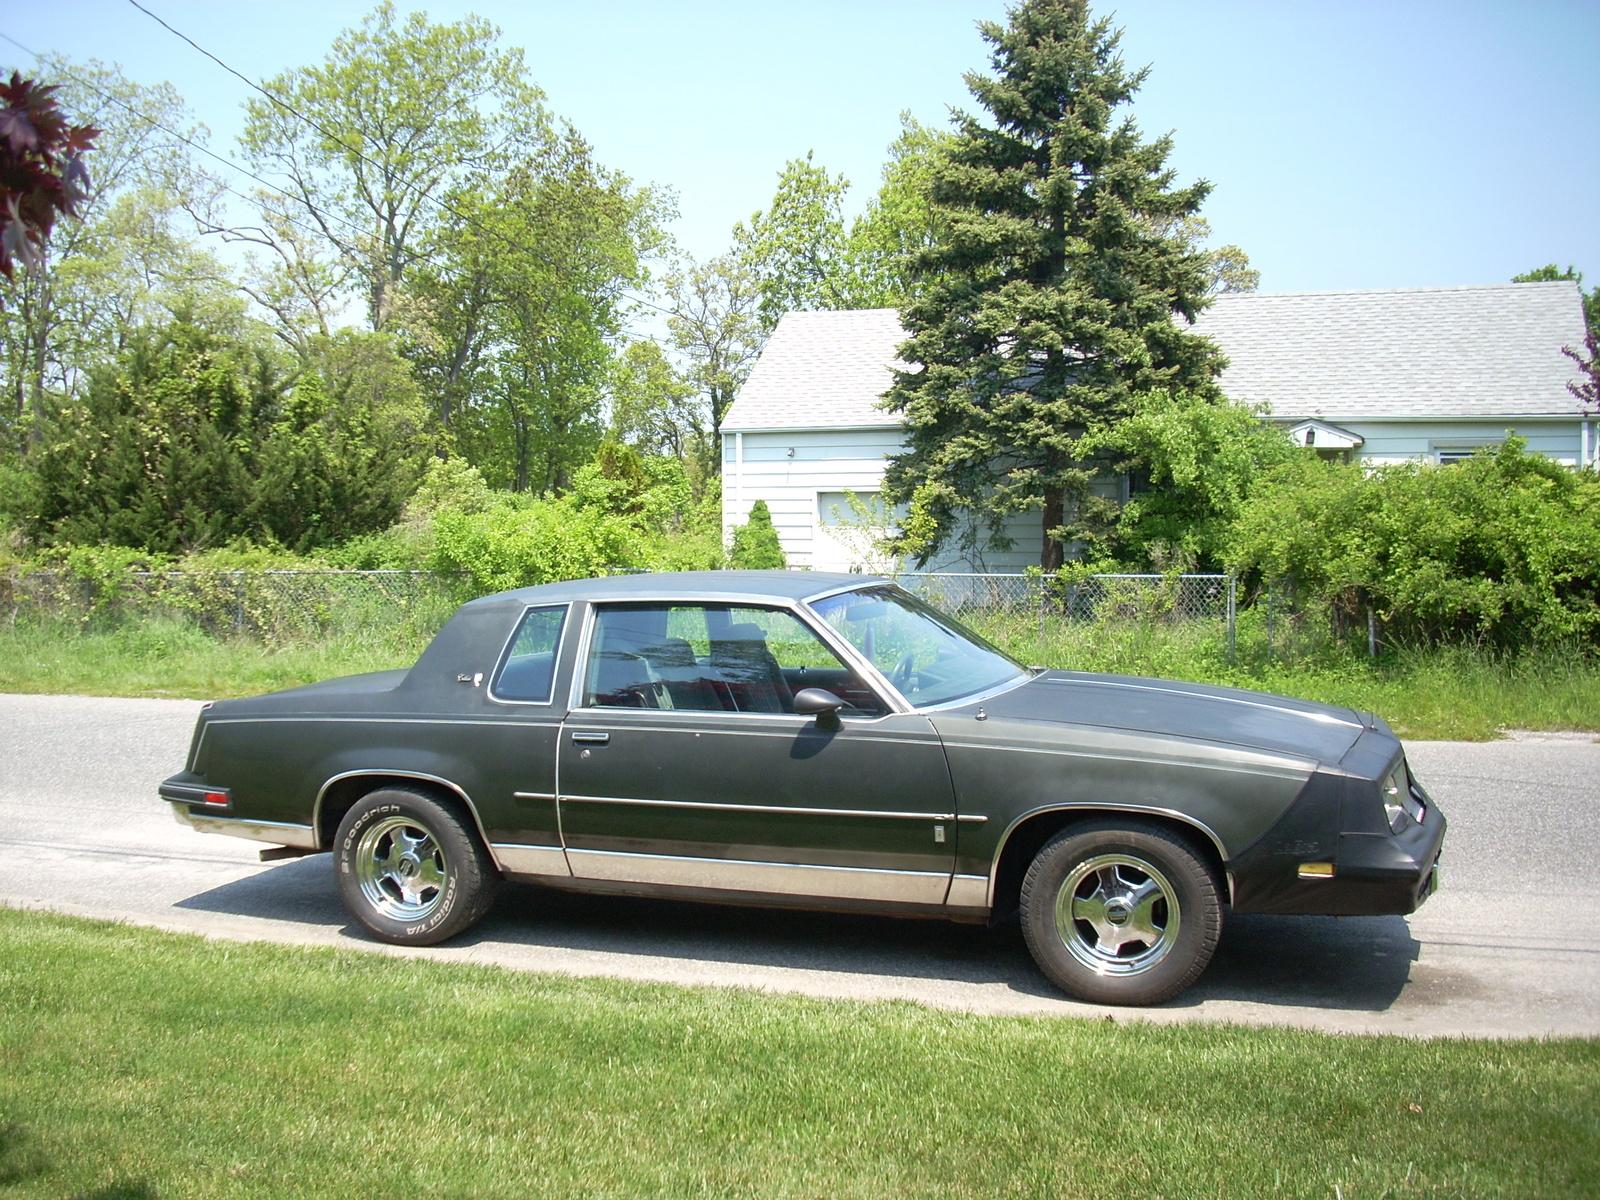 1983 Oldsmobile Cutlass Supreme, 1985 Oldsmobile Cutlass Calais ...